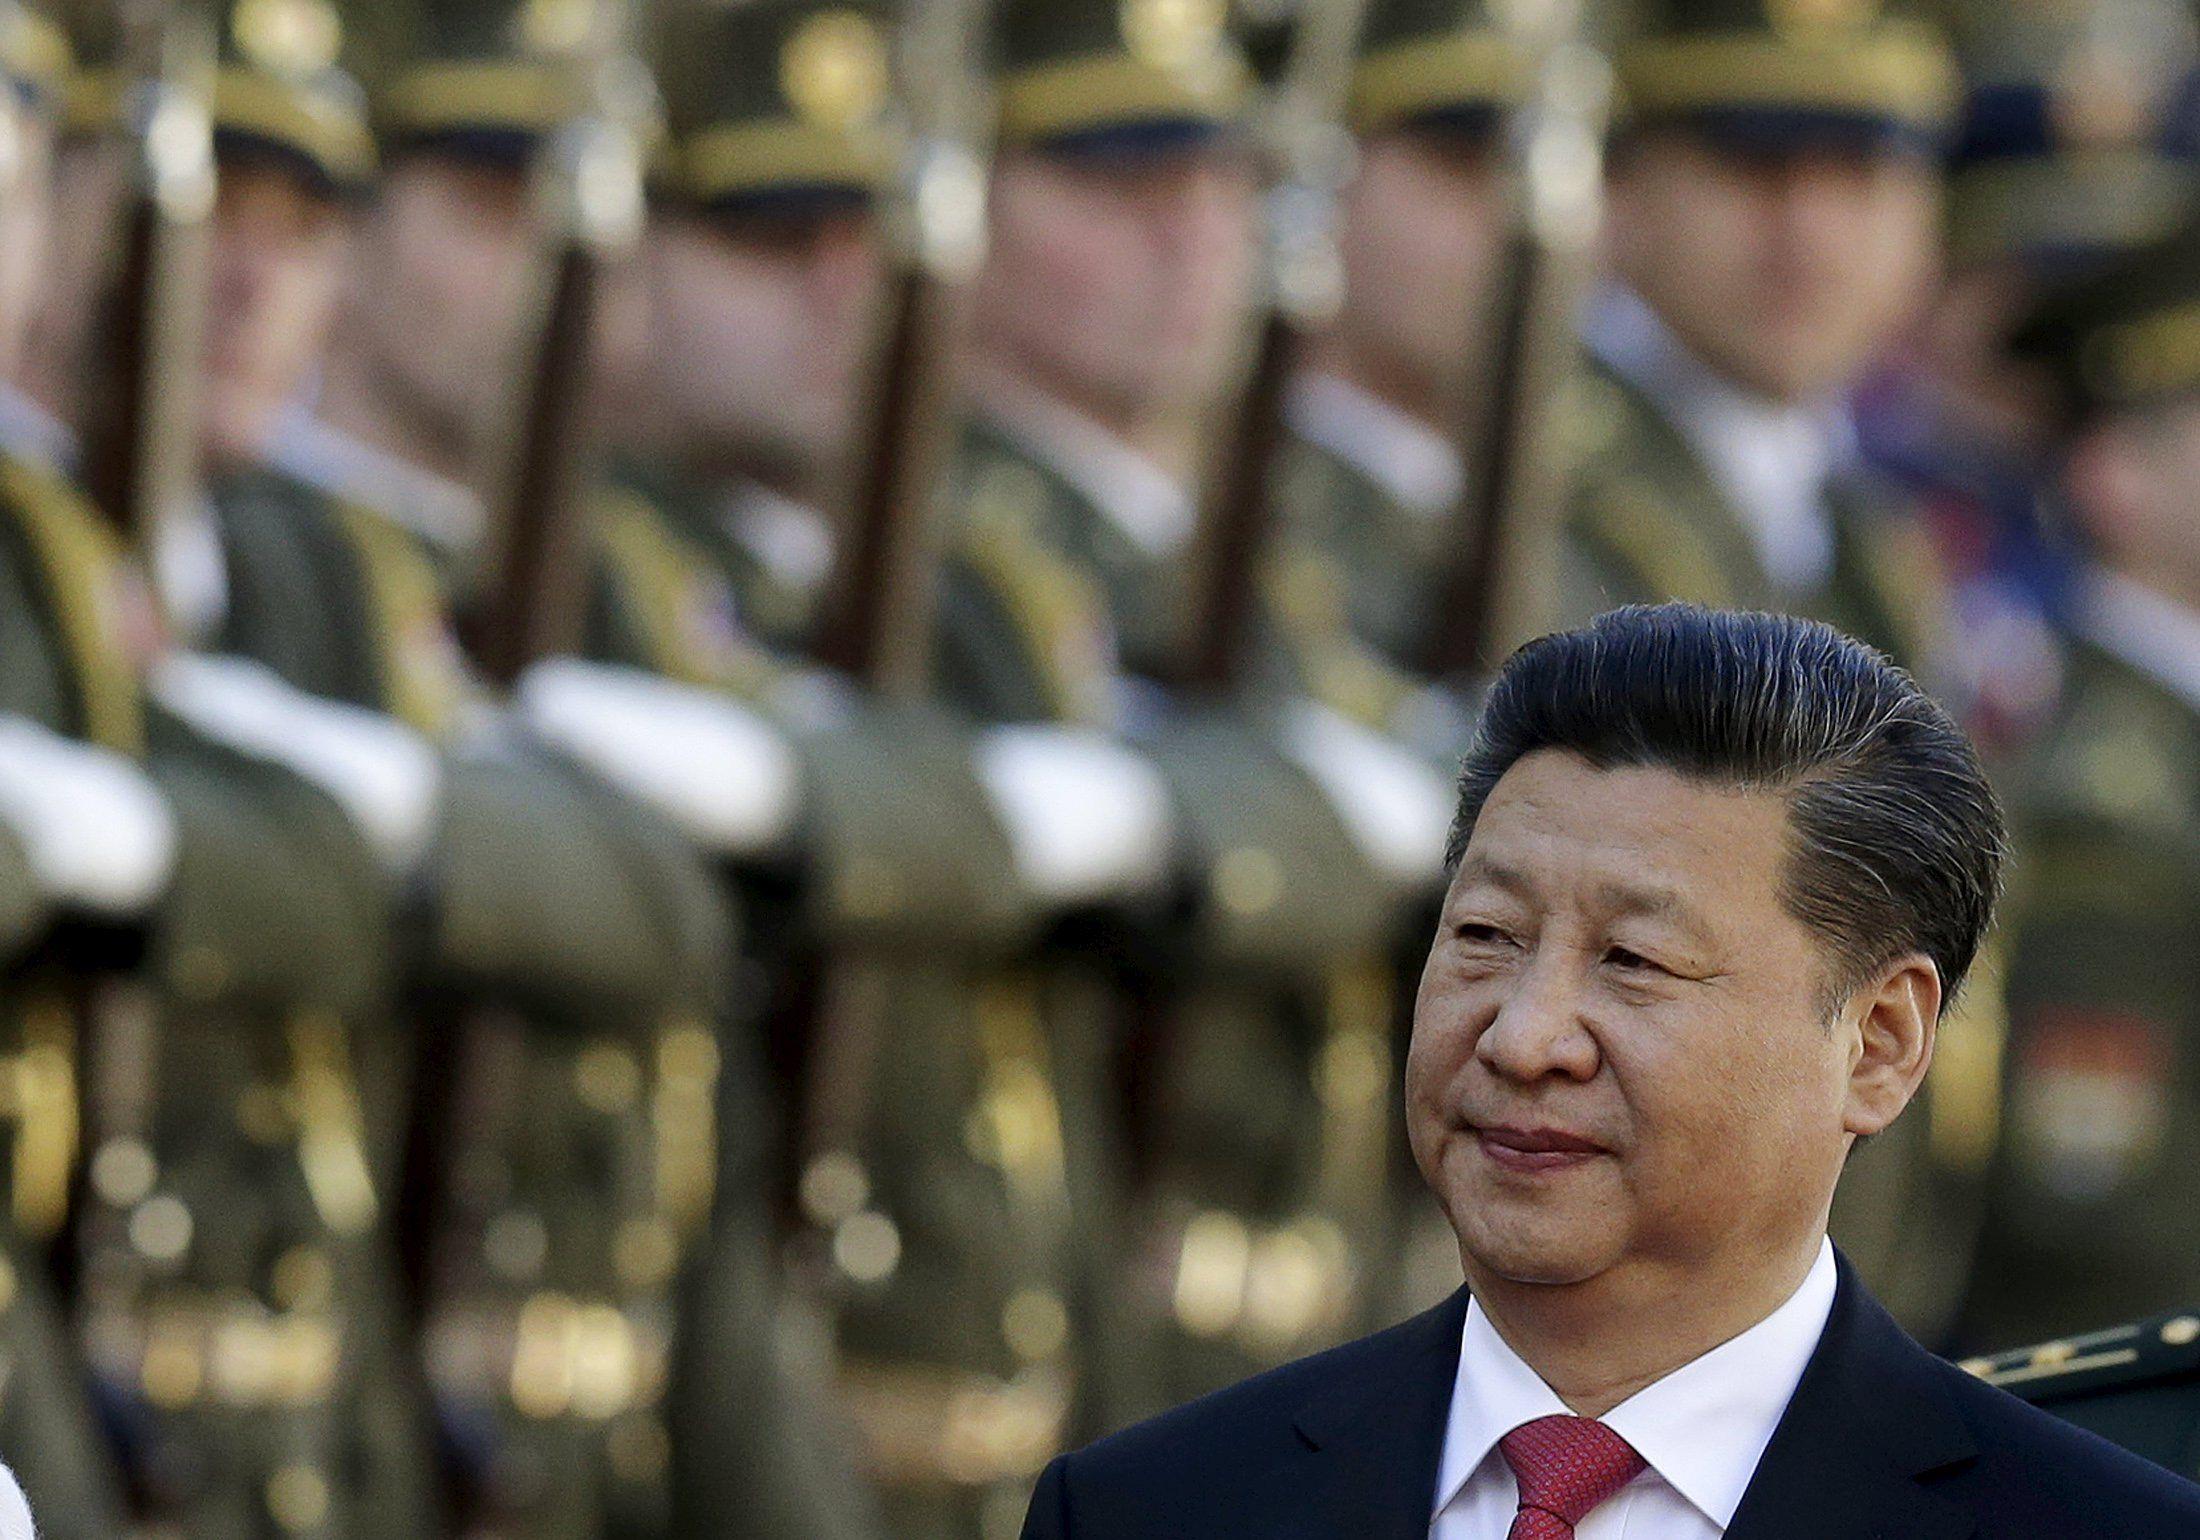 china_editor_resigns_media_0329